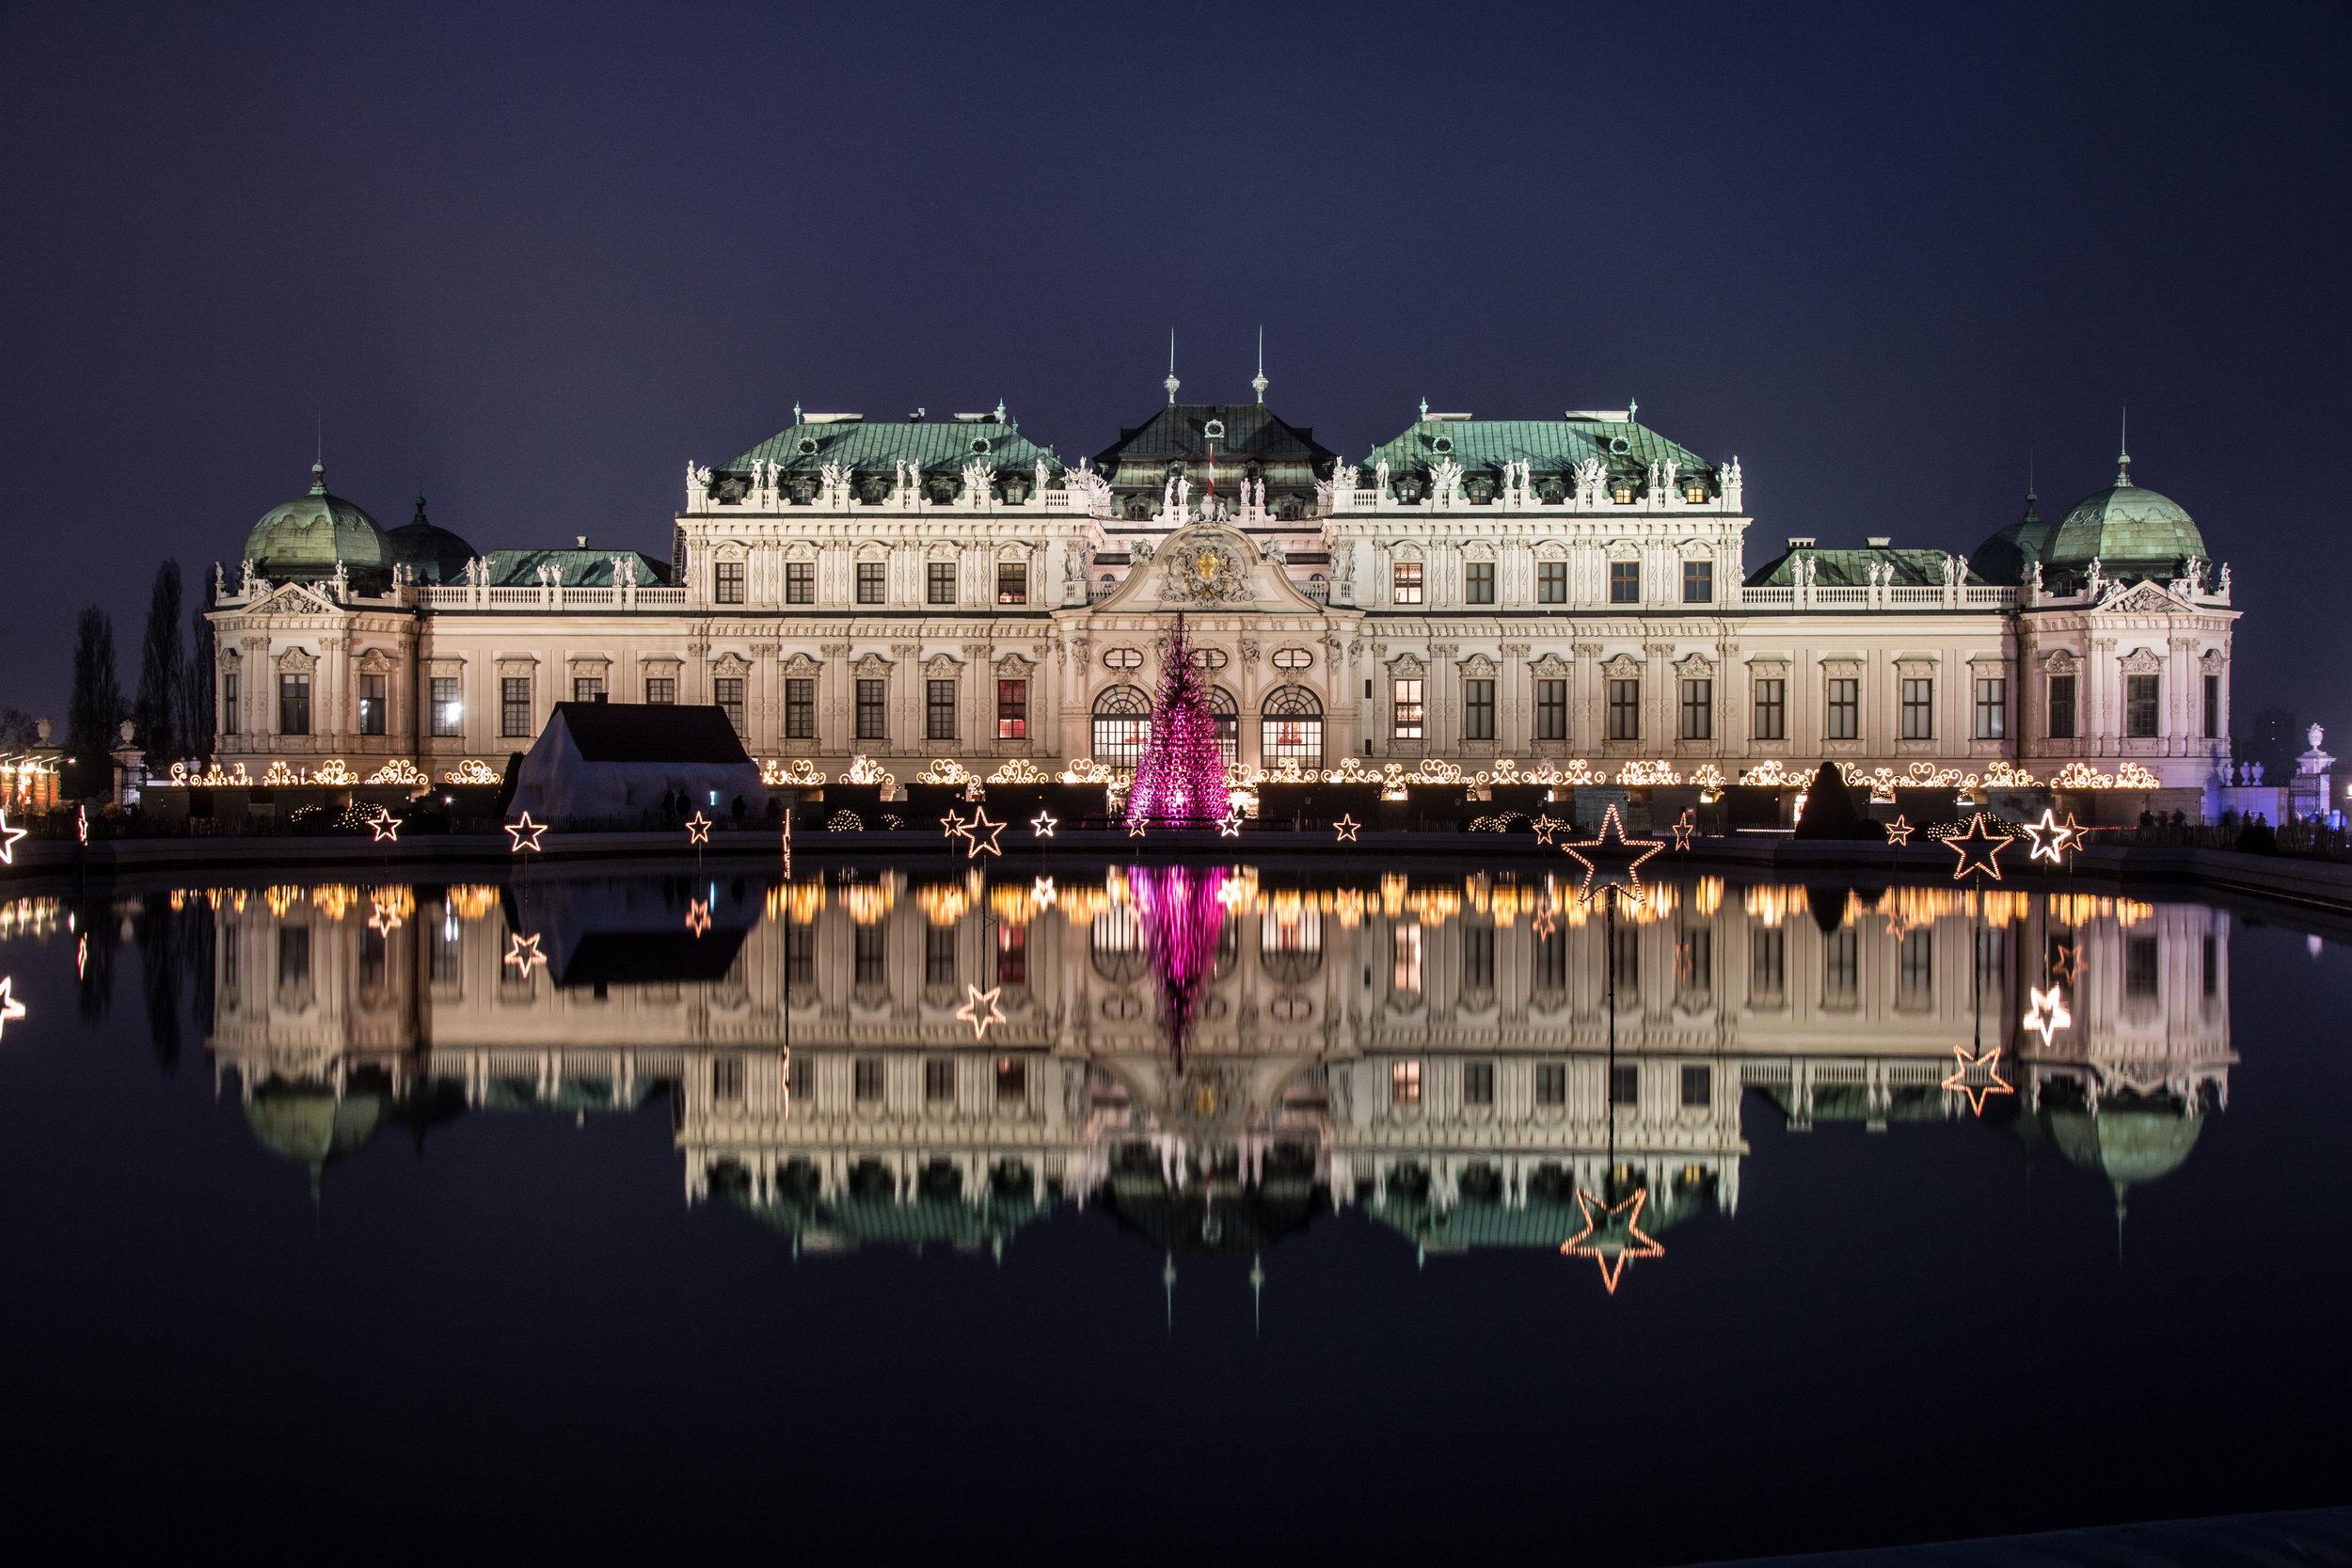 1030 Wien - Schloss Belvedere   EOS 70D - F/8 - 4 Sek - ISO 100 - 26mm